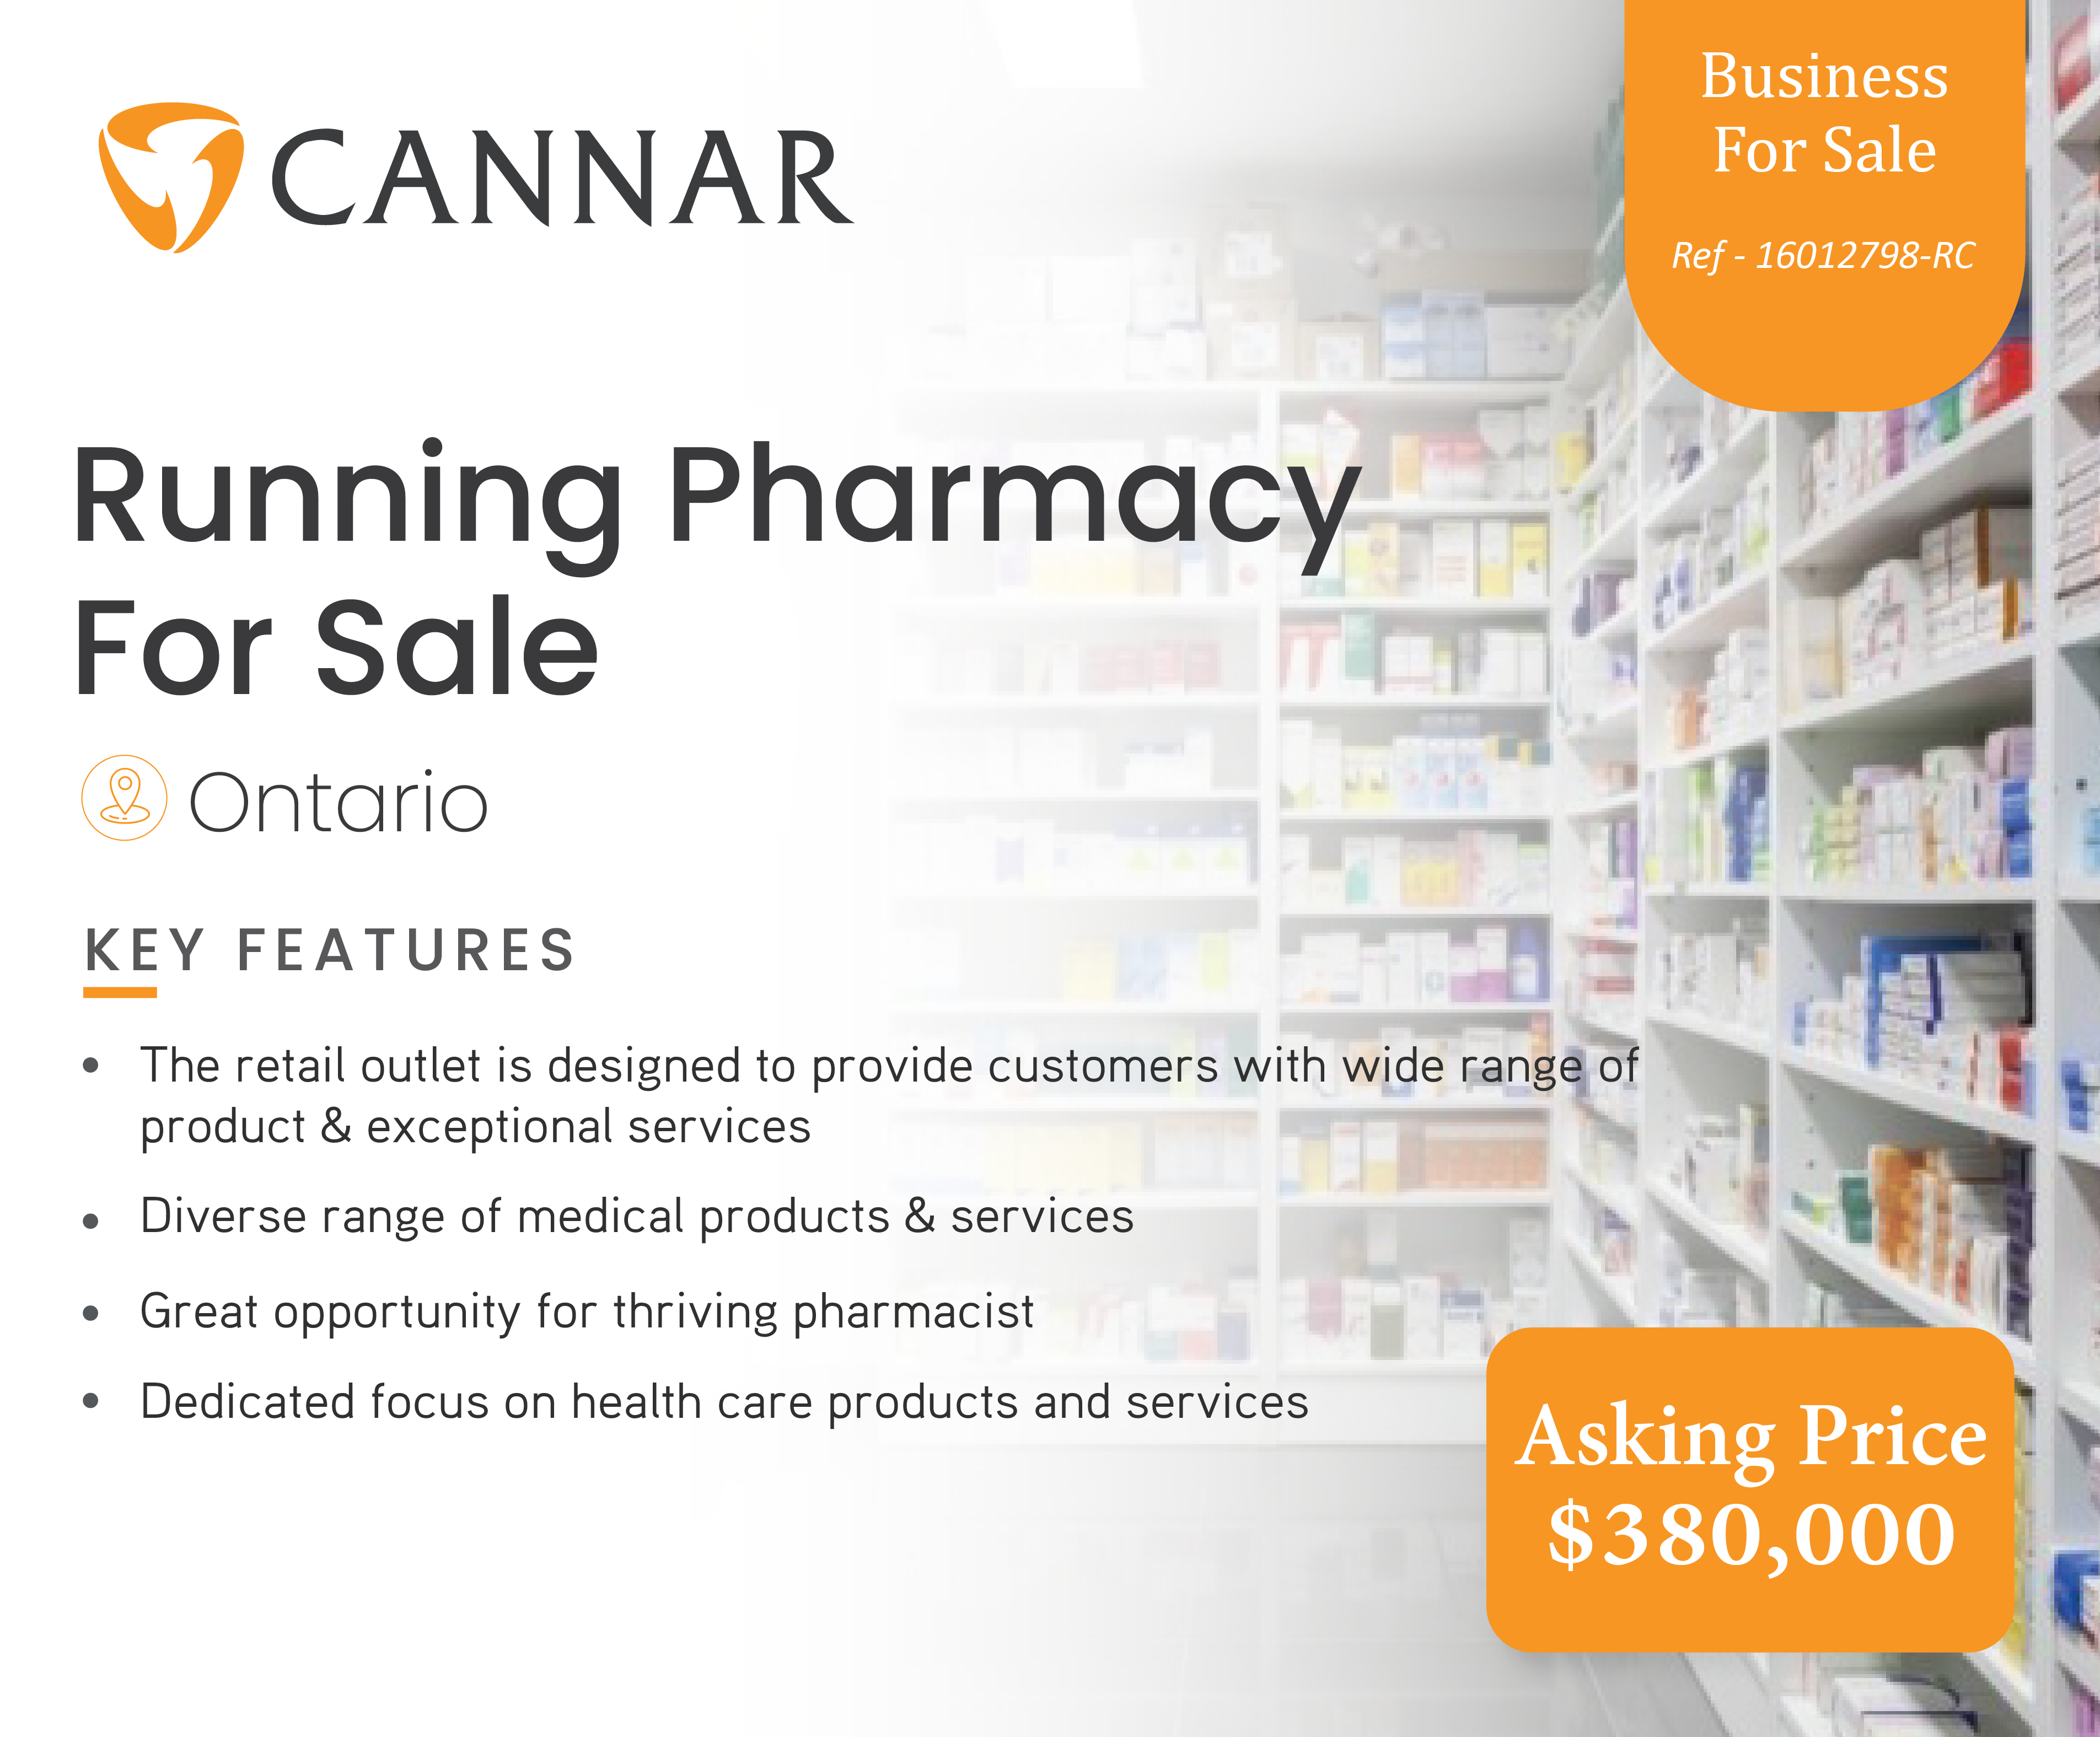 Running Pharmacy For Sale In Ontario